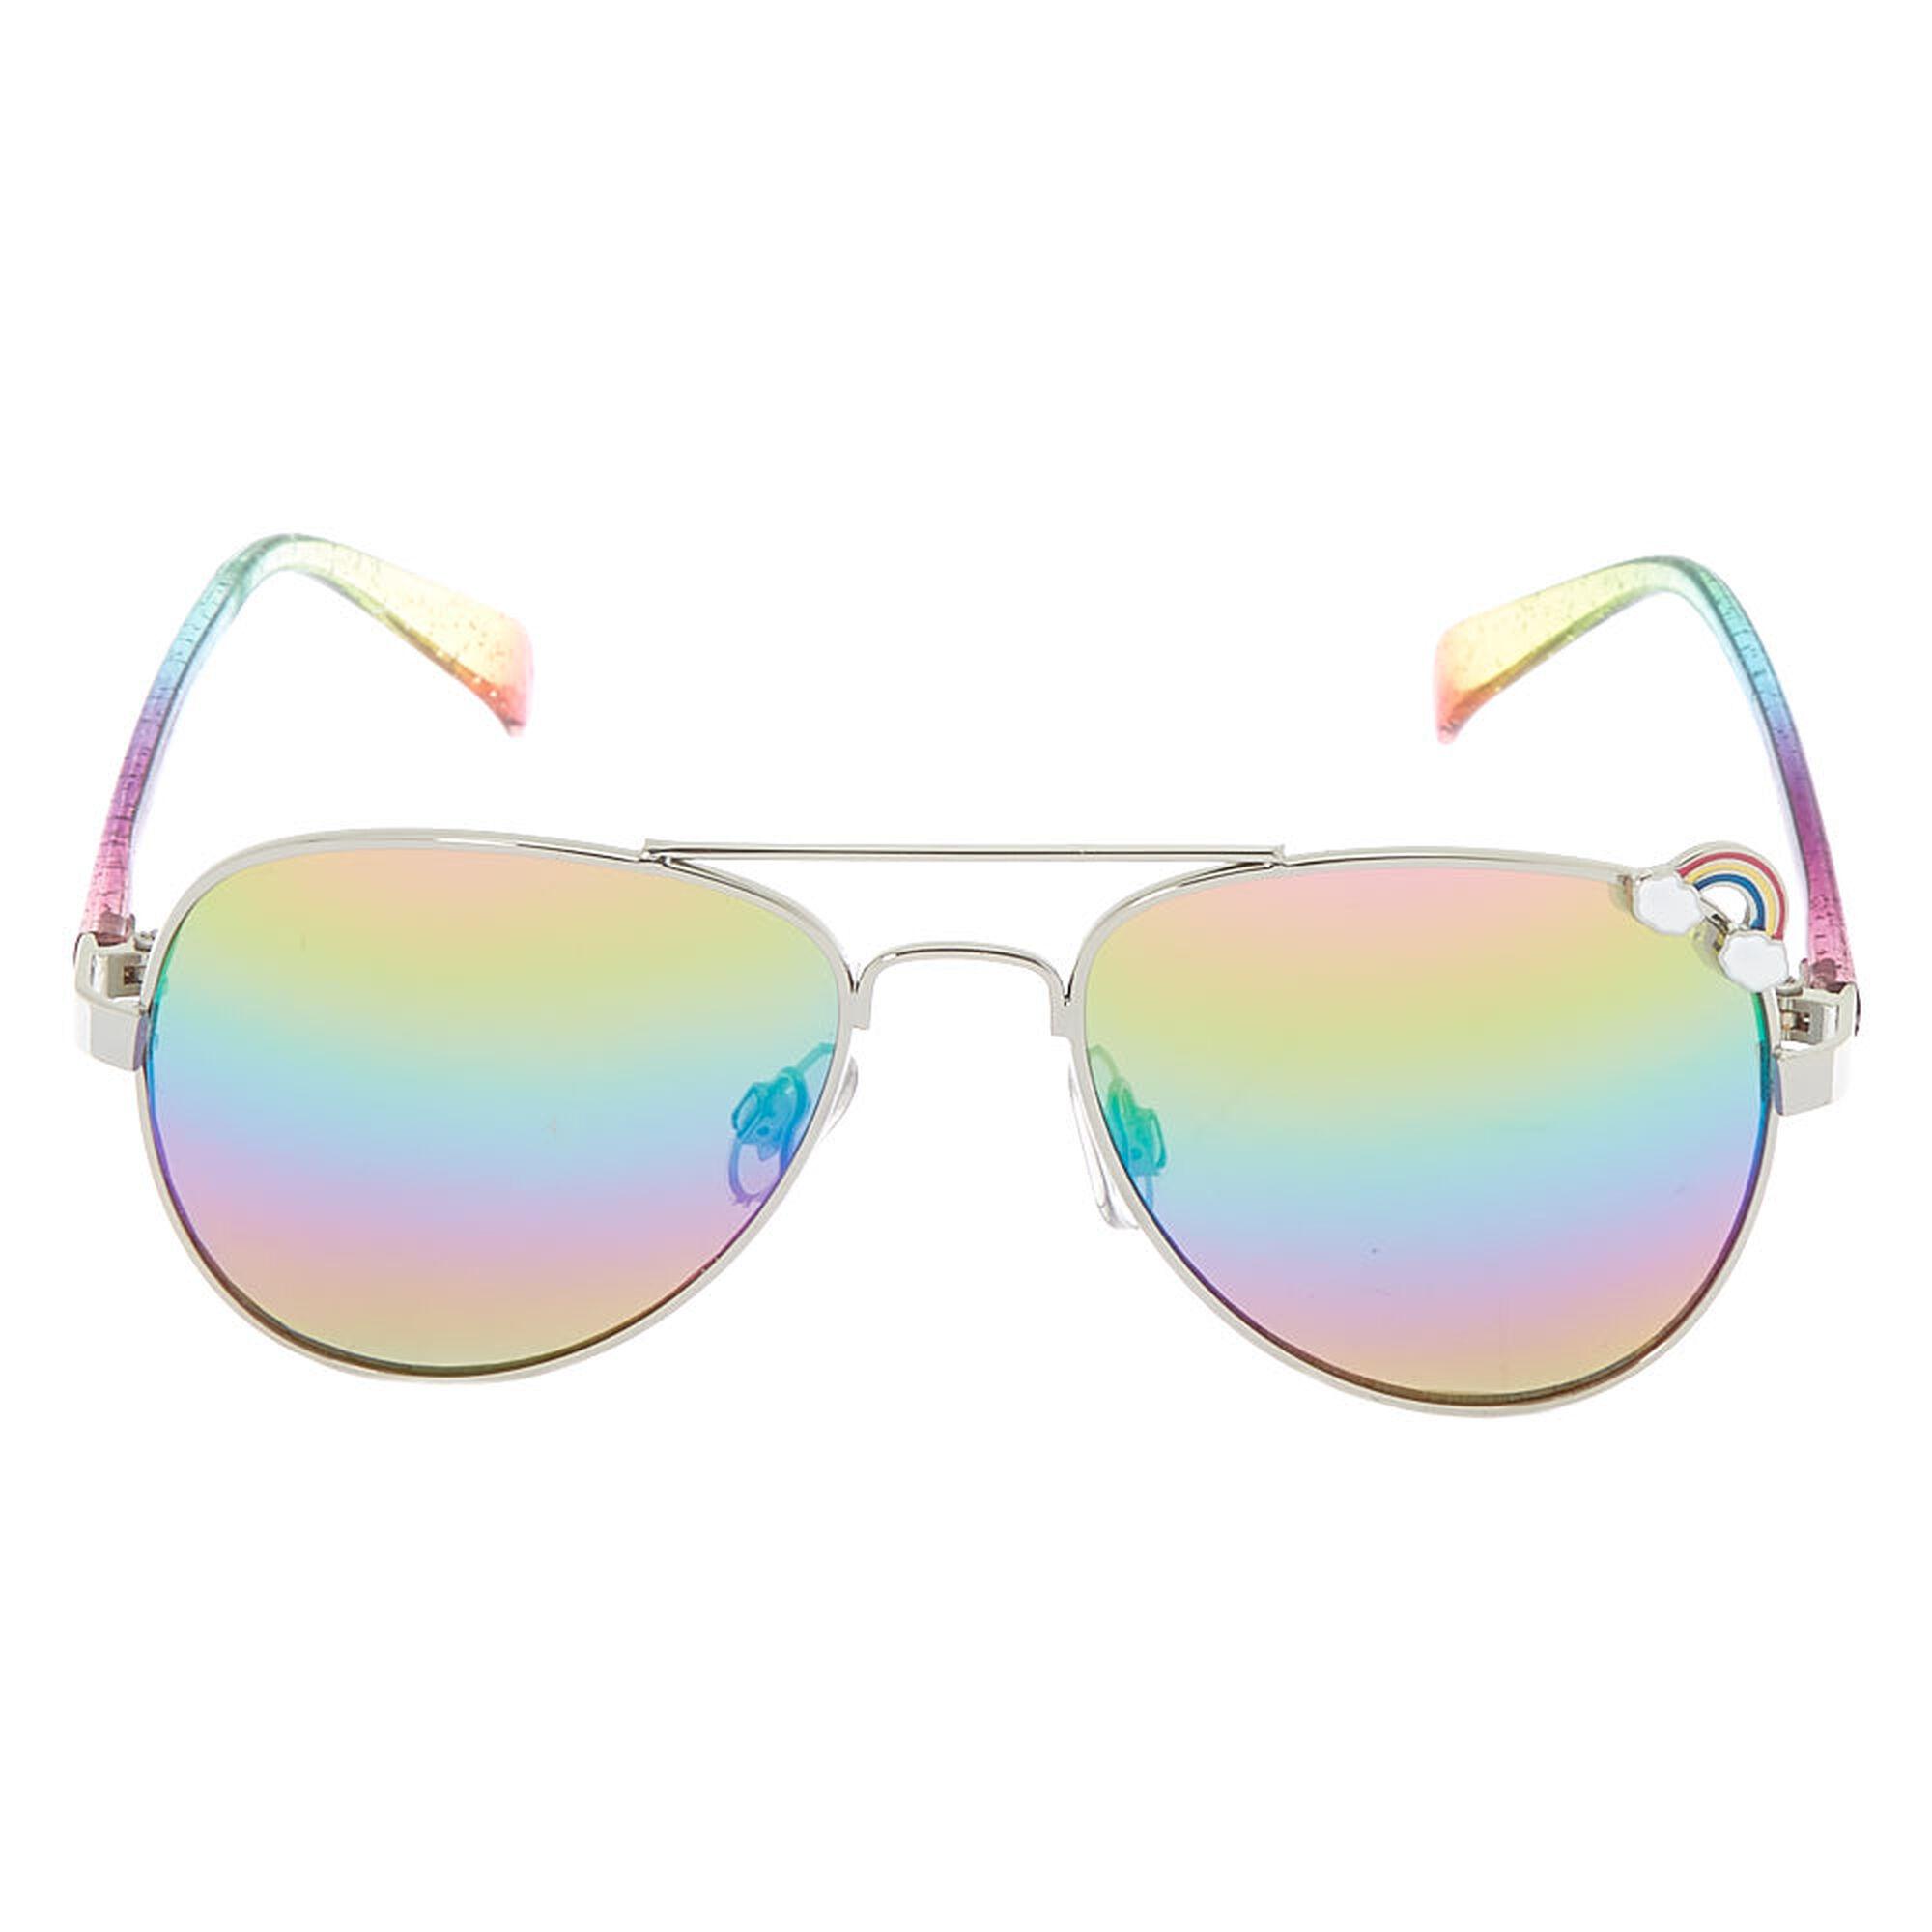 247a1fb39d ... Claire  39 s Club Rainbow Aviator Sunglasses